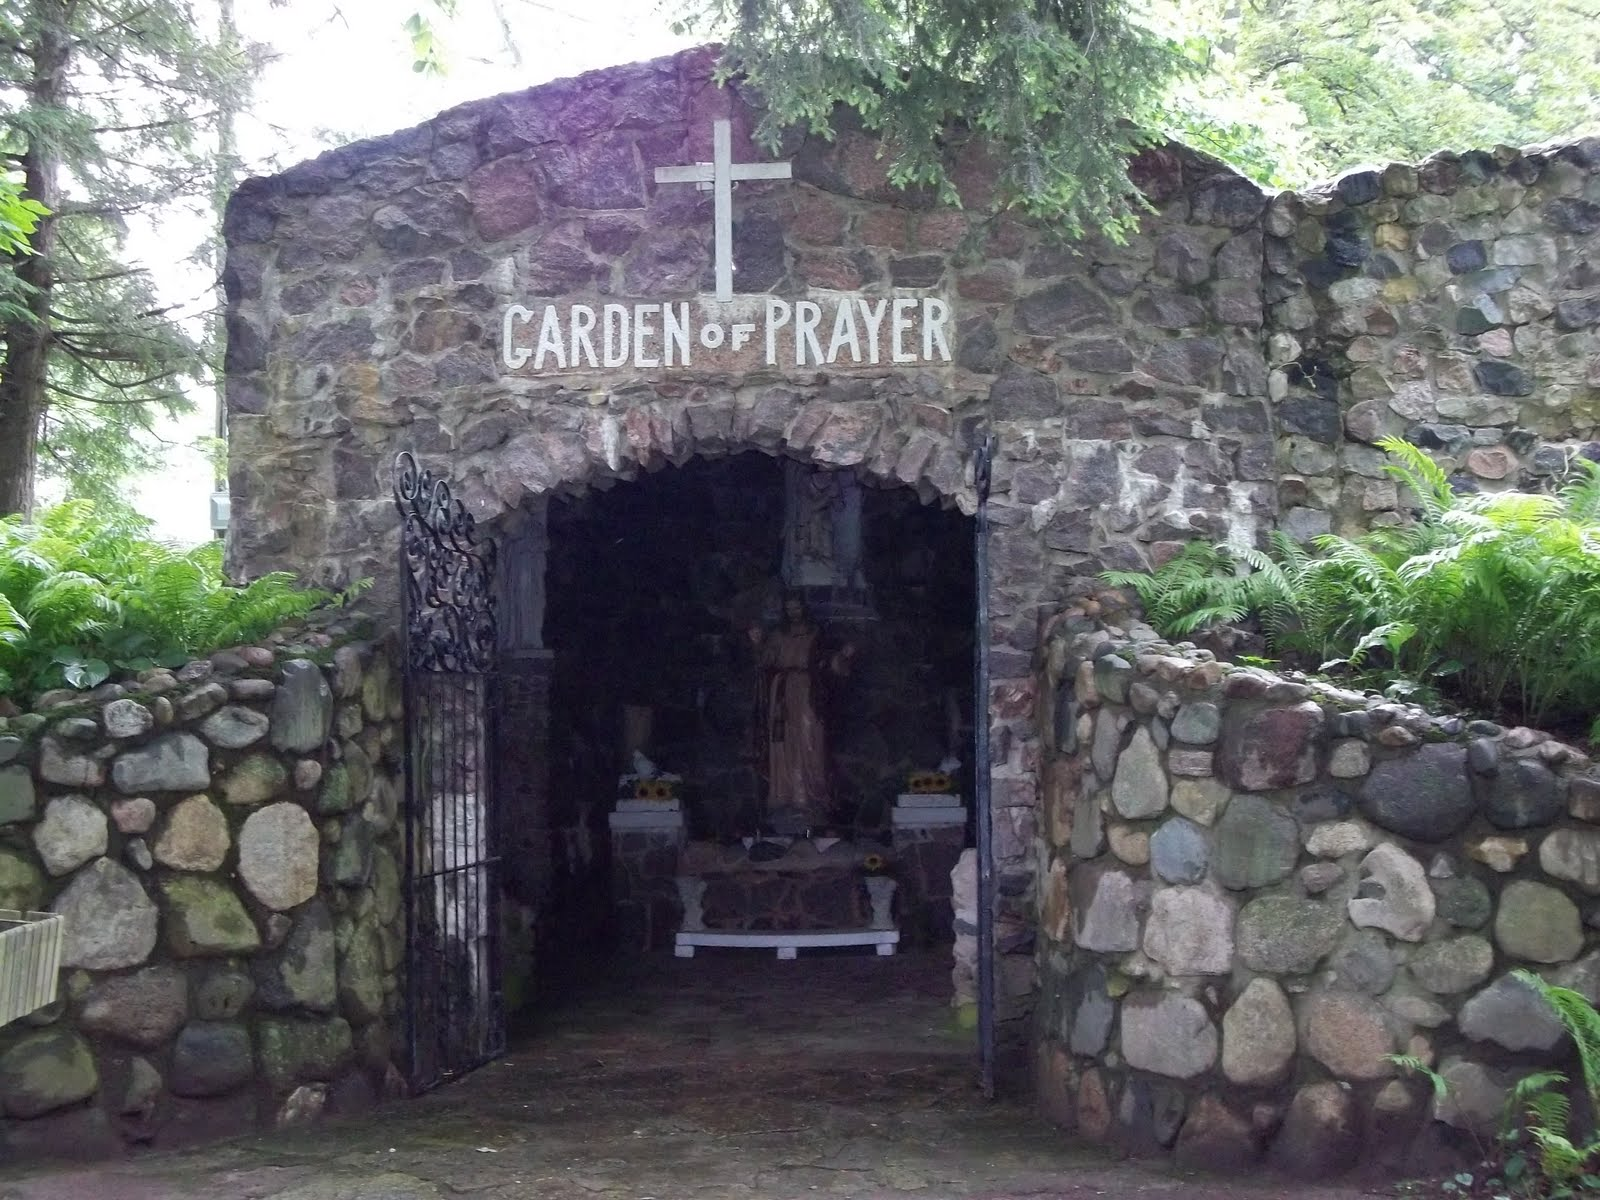 Garden of Prayer - Inside Camp Chesterfield